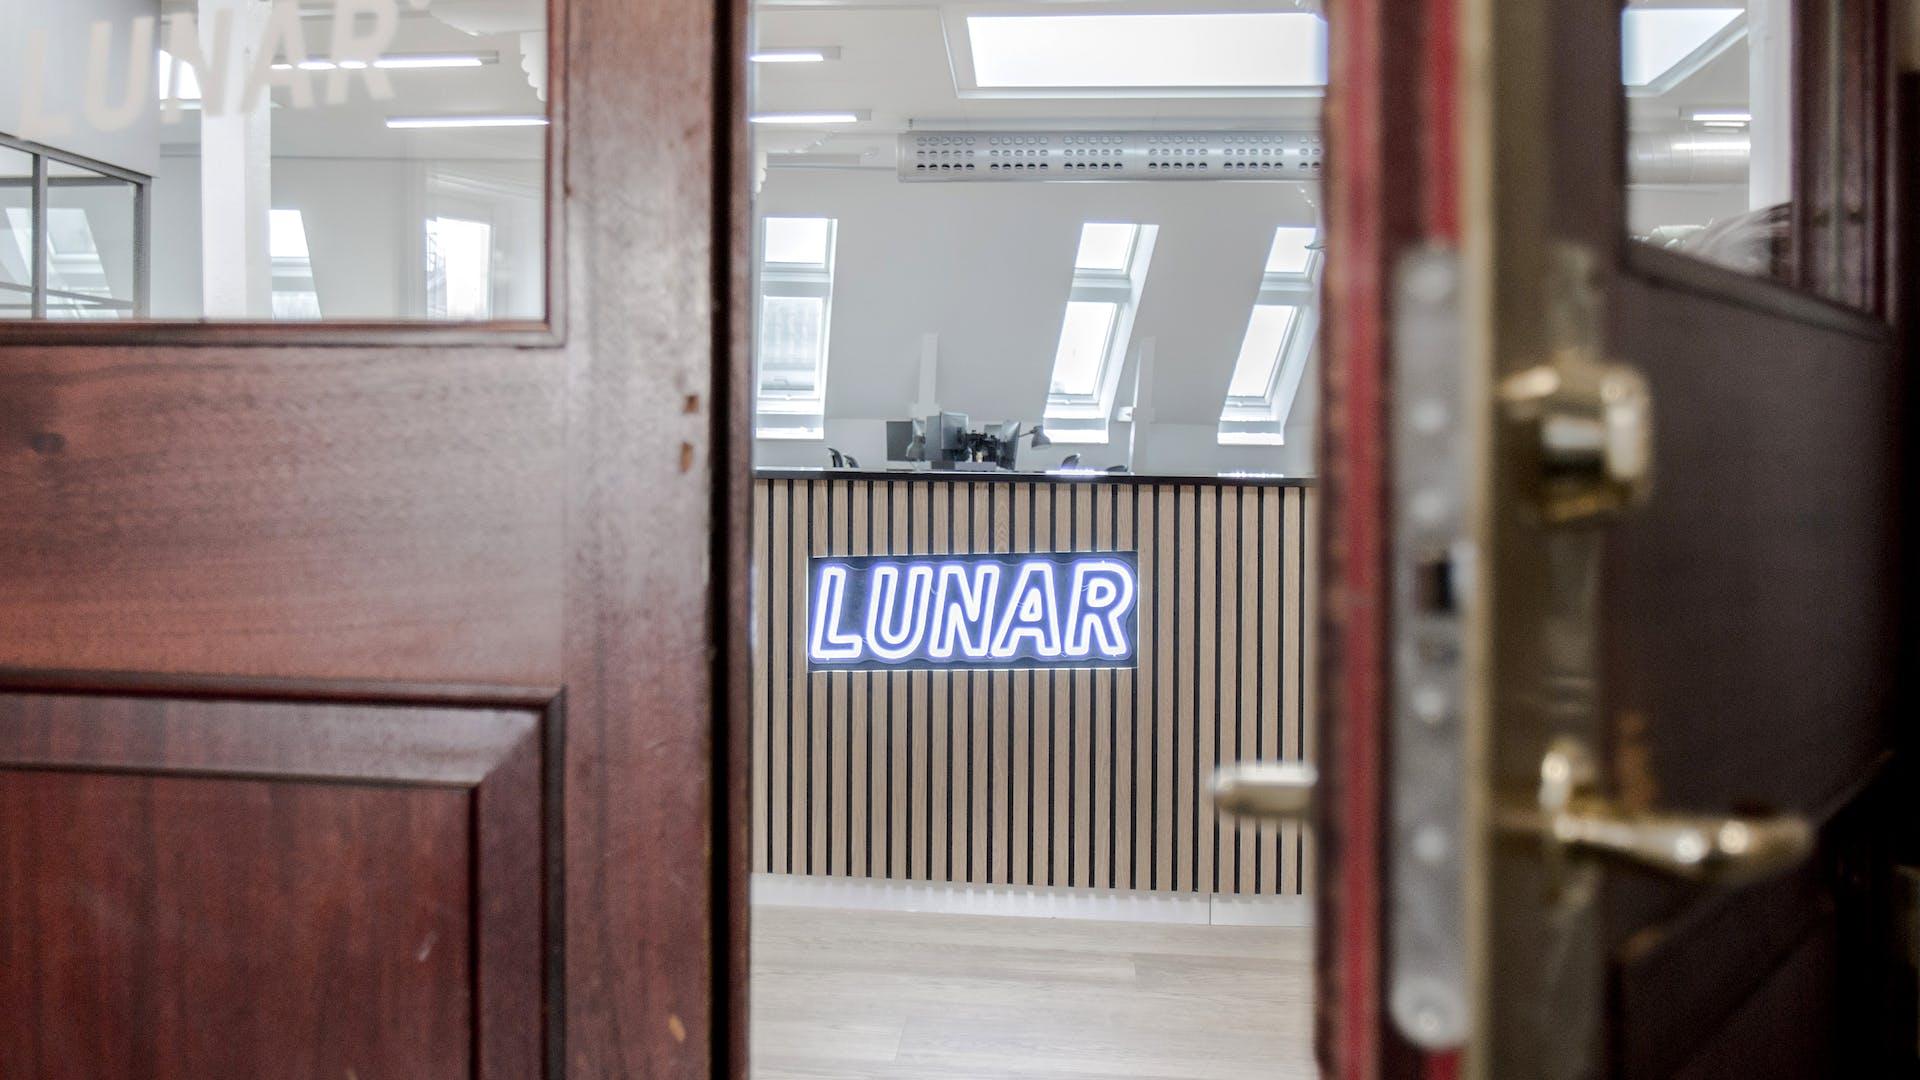 Lunar entrance